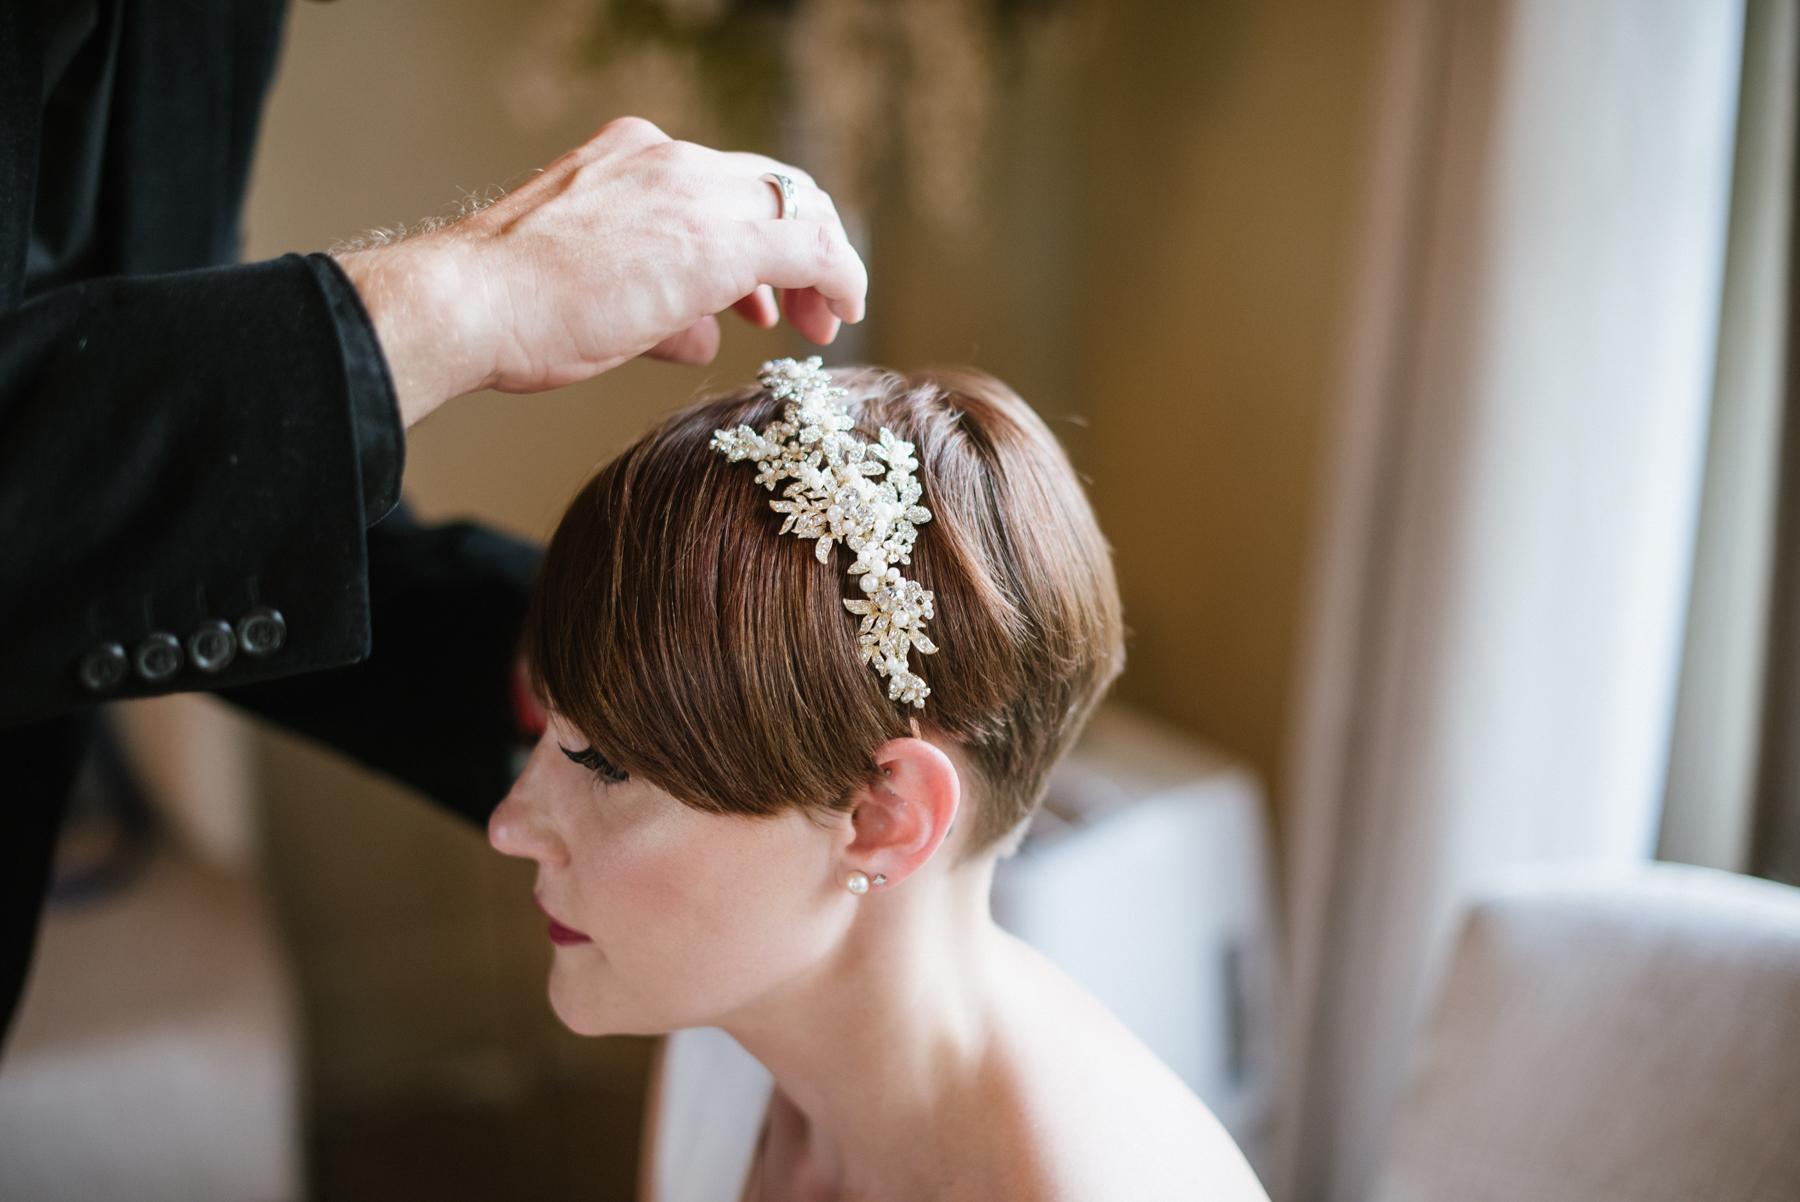 Secret Garden Event Center Wedding - Meredith Amadee Photography-7-3.jpg